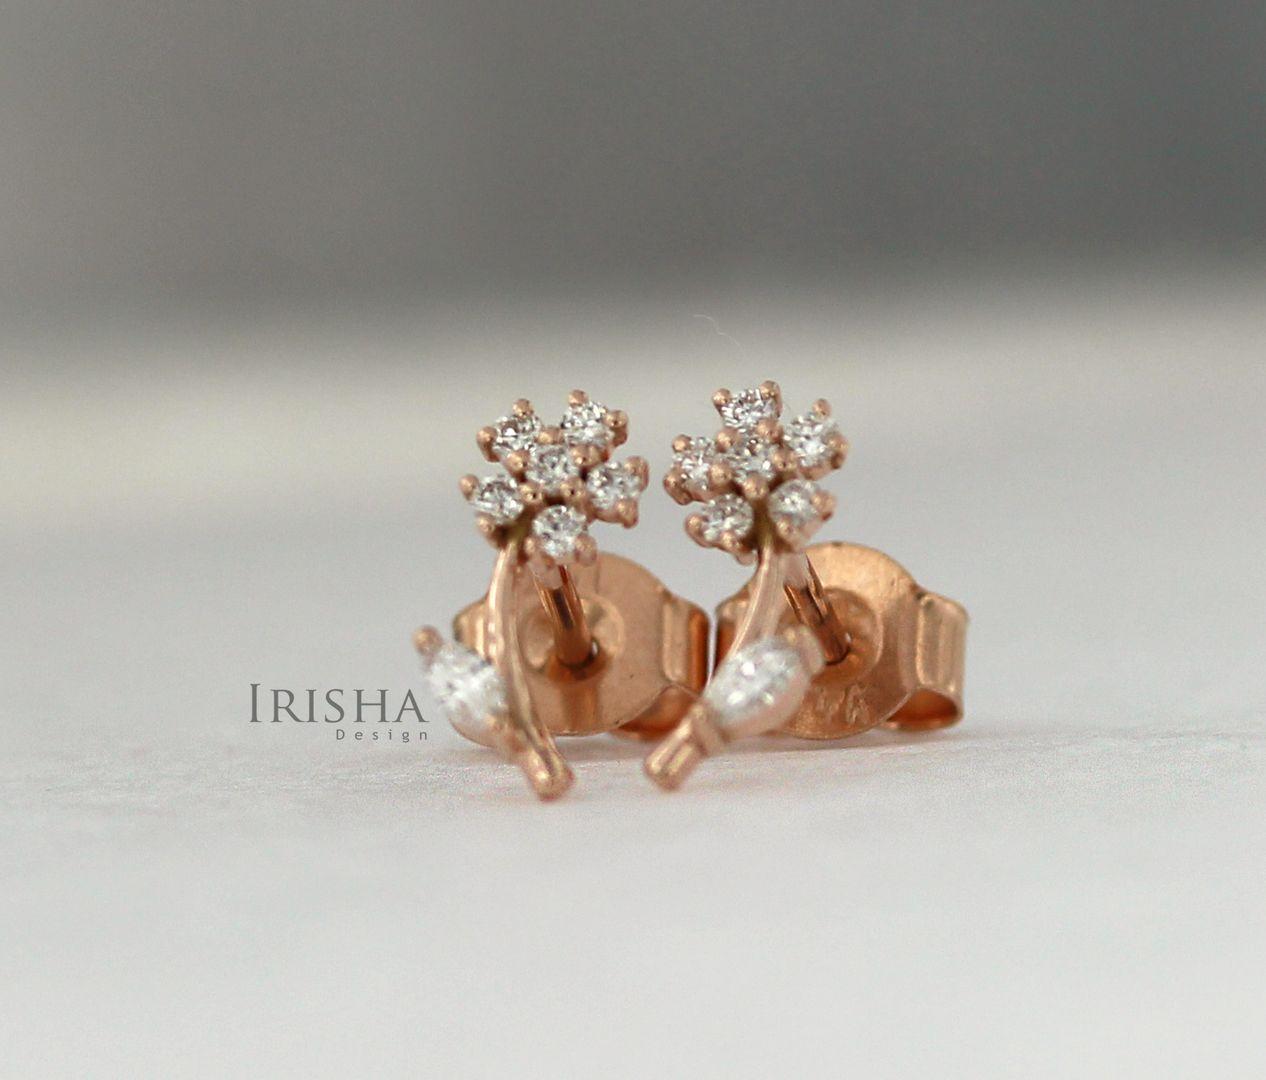 14K Gold 0.20 Ct. Genuine Diamond Leaf Floral Design Studs Earrings Fine Jewelry